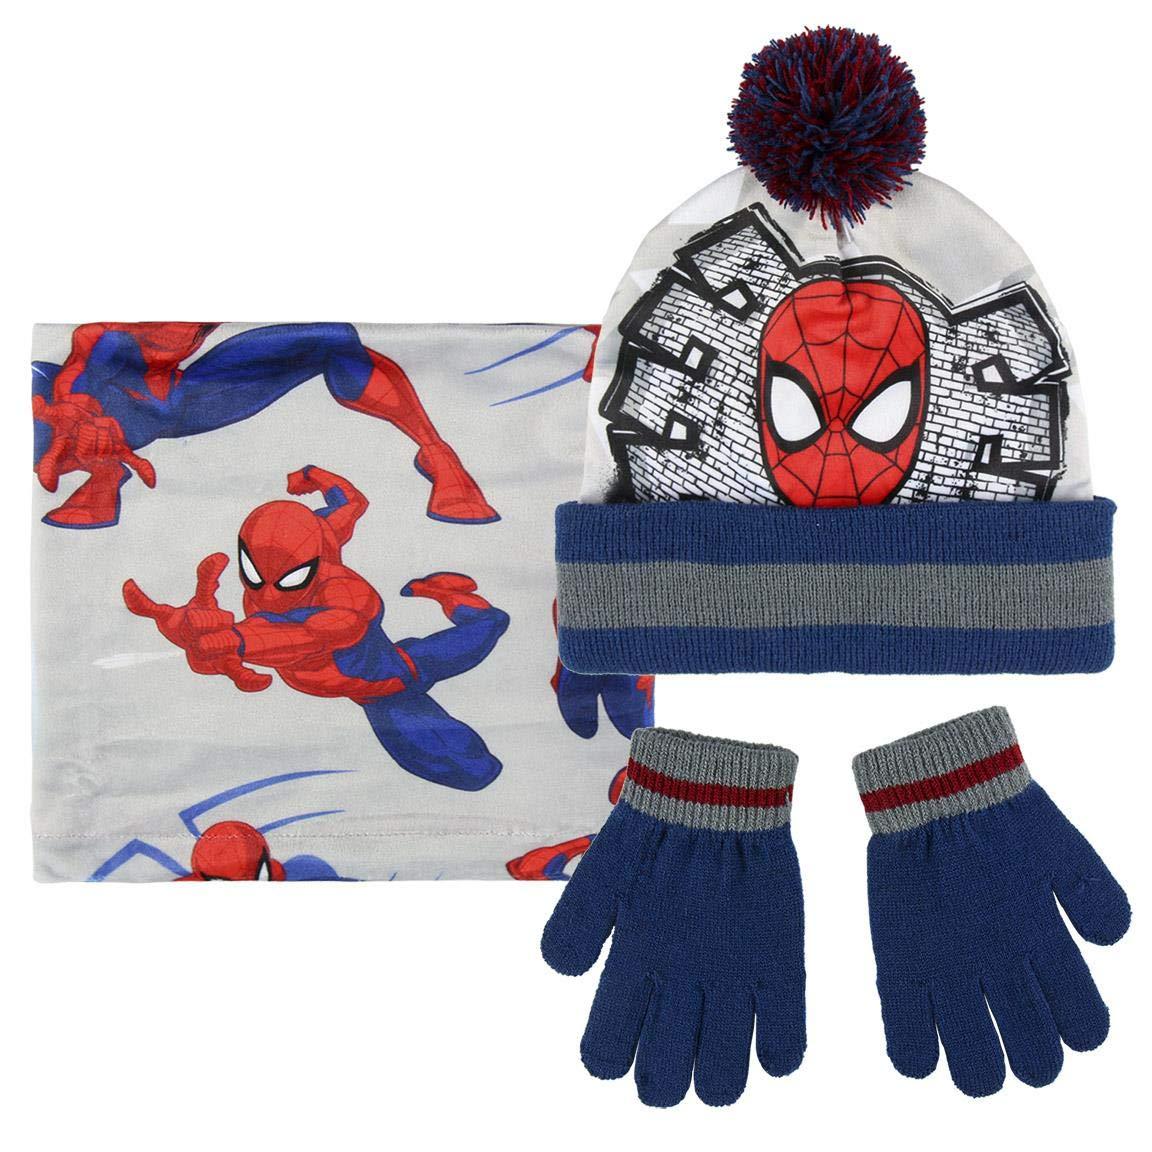 Cerdá Boy's Conjunto 3 Piezas Spiderman Scarf, Hat and Glove Set, Grey (Gris 001), One Size (Manufacturer Size: Única) 2200003203